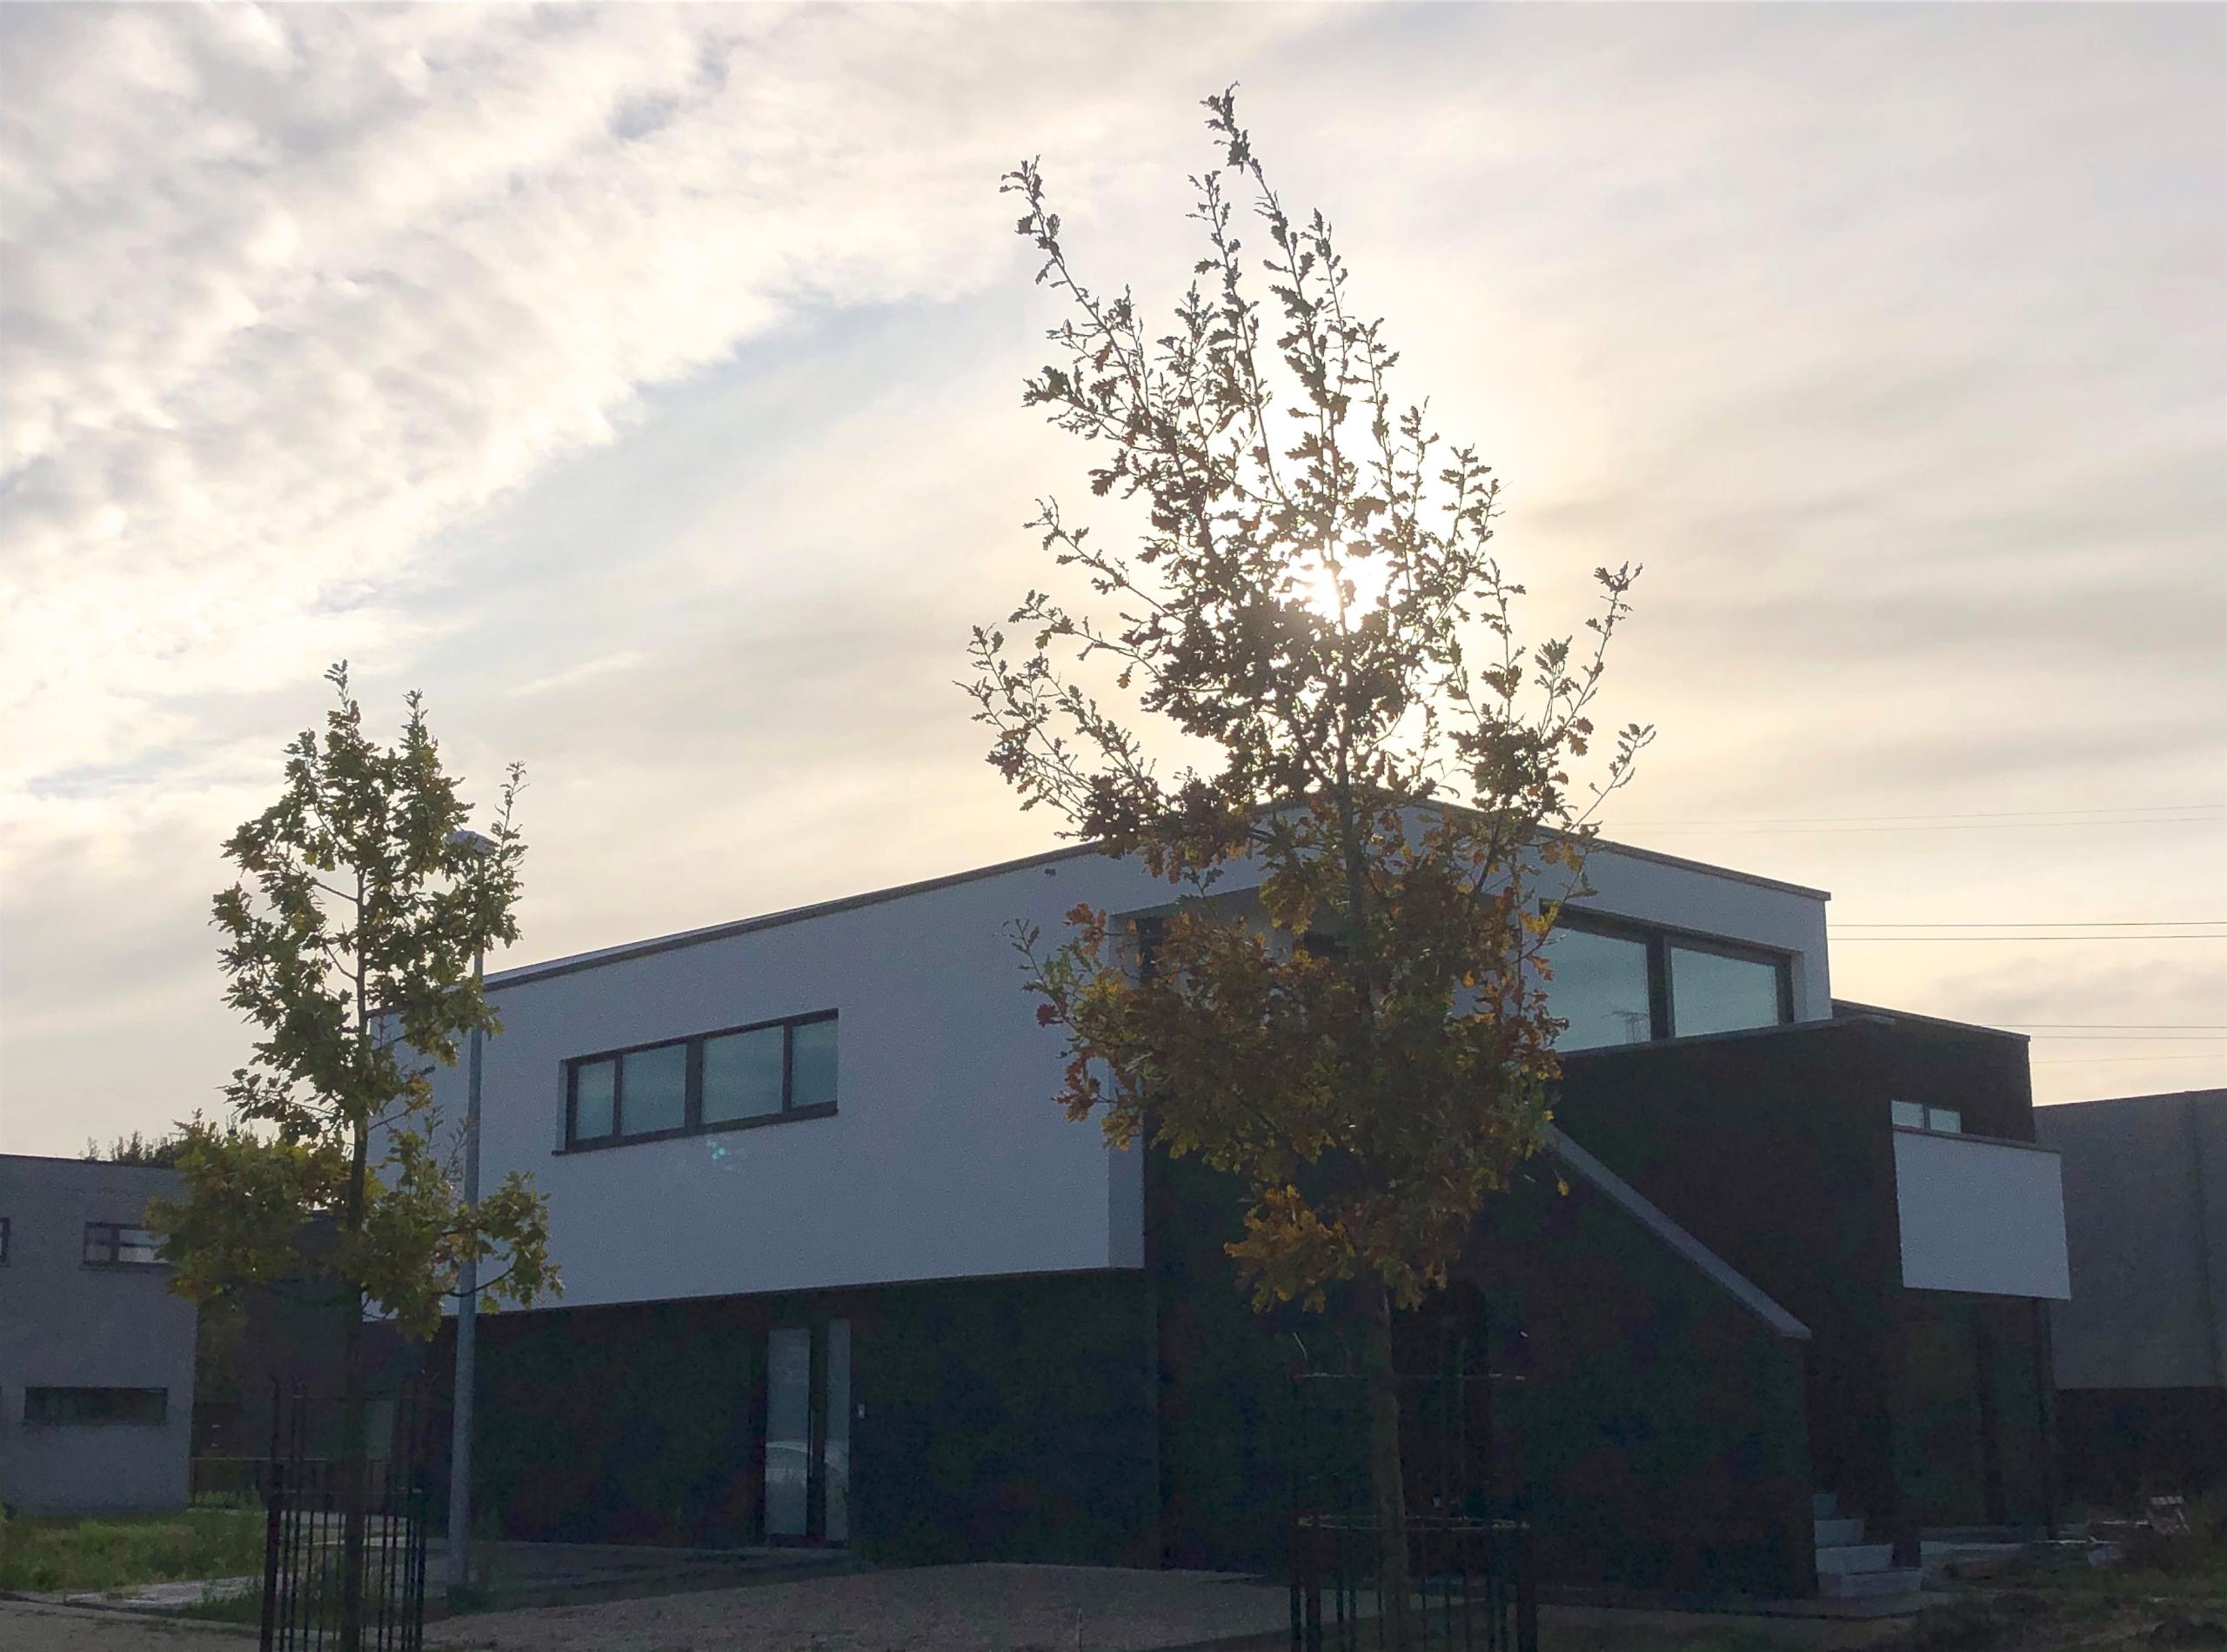 Architect Neeuwbouw Belsele